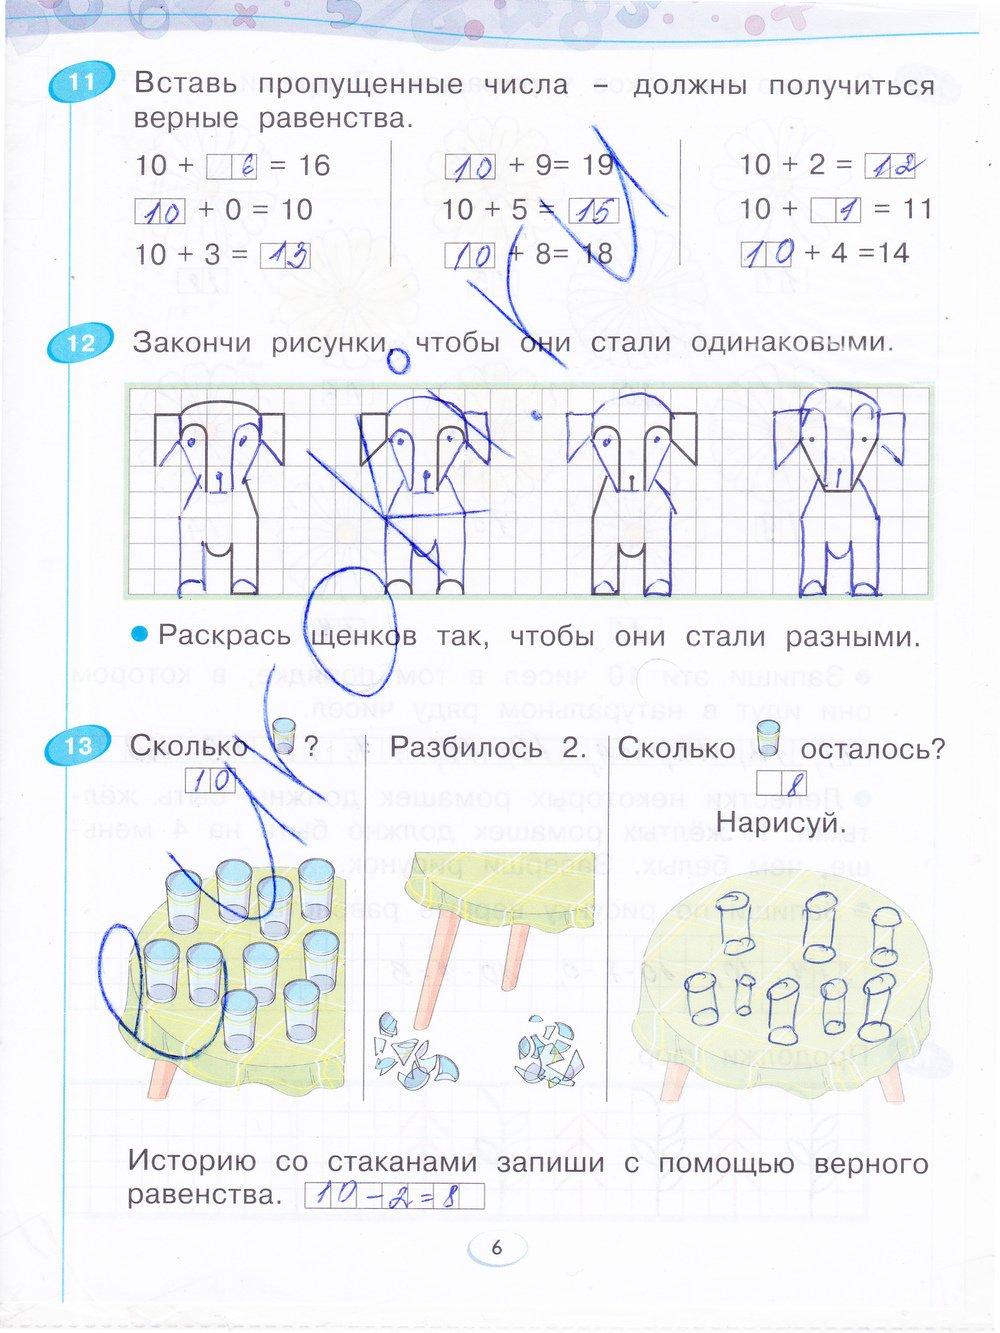 Решебник математика рабочая тетрадь 1 класс бененсон итина рабочая тетрадь 3